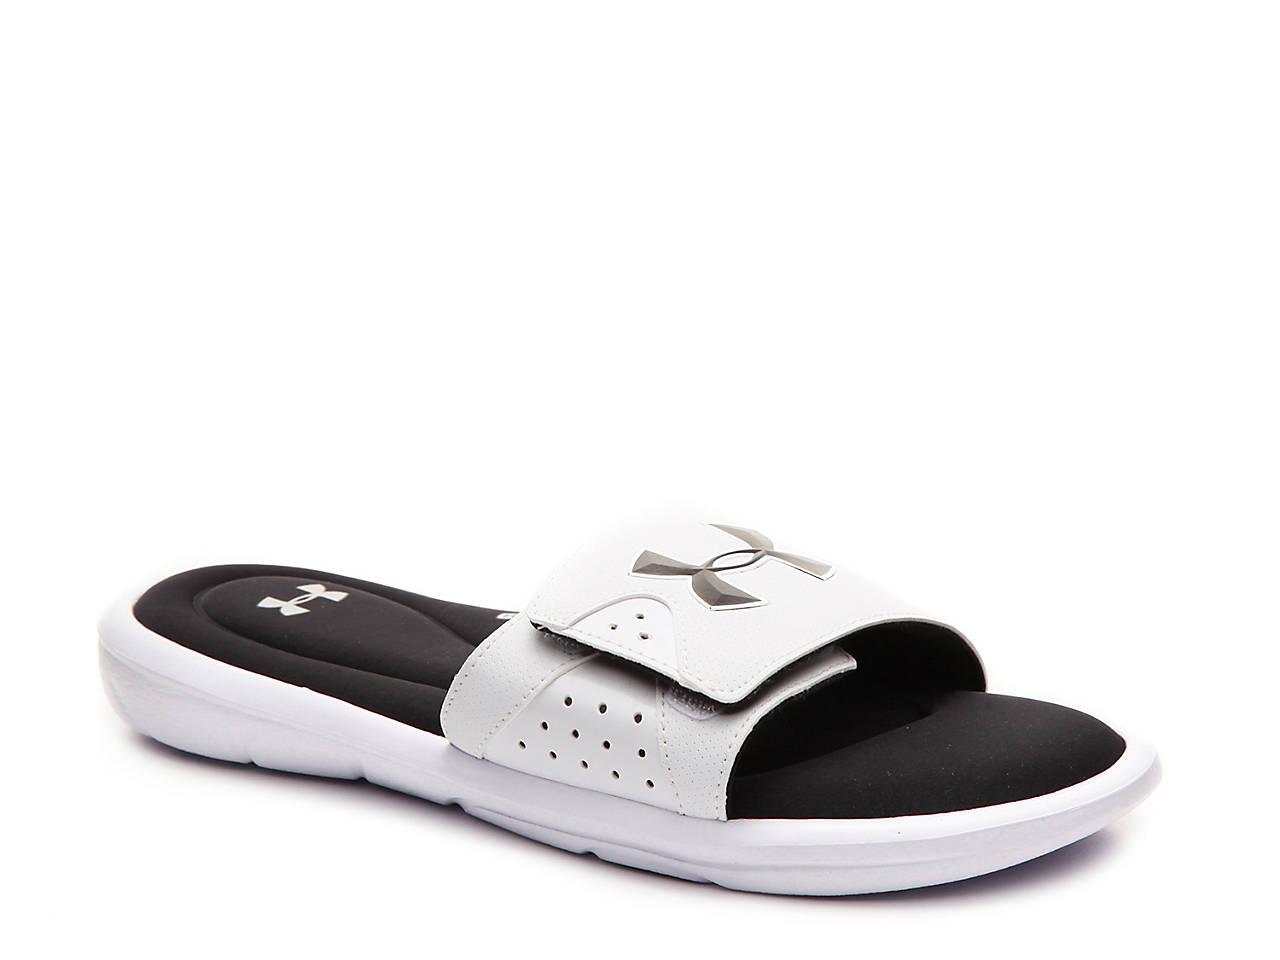 Black sandals at dsw - Ignite Iv Slide Sandal